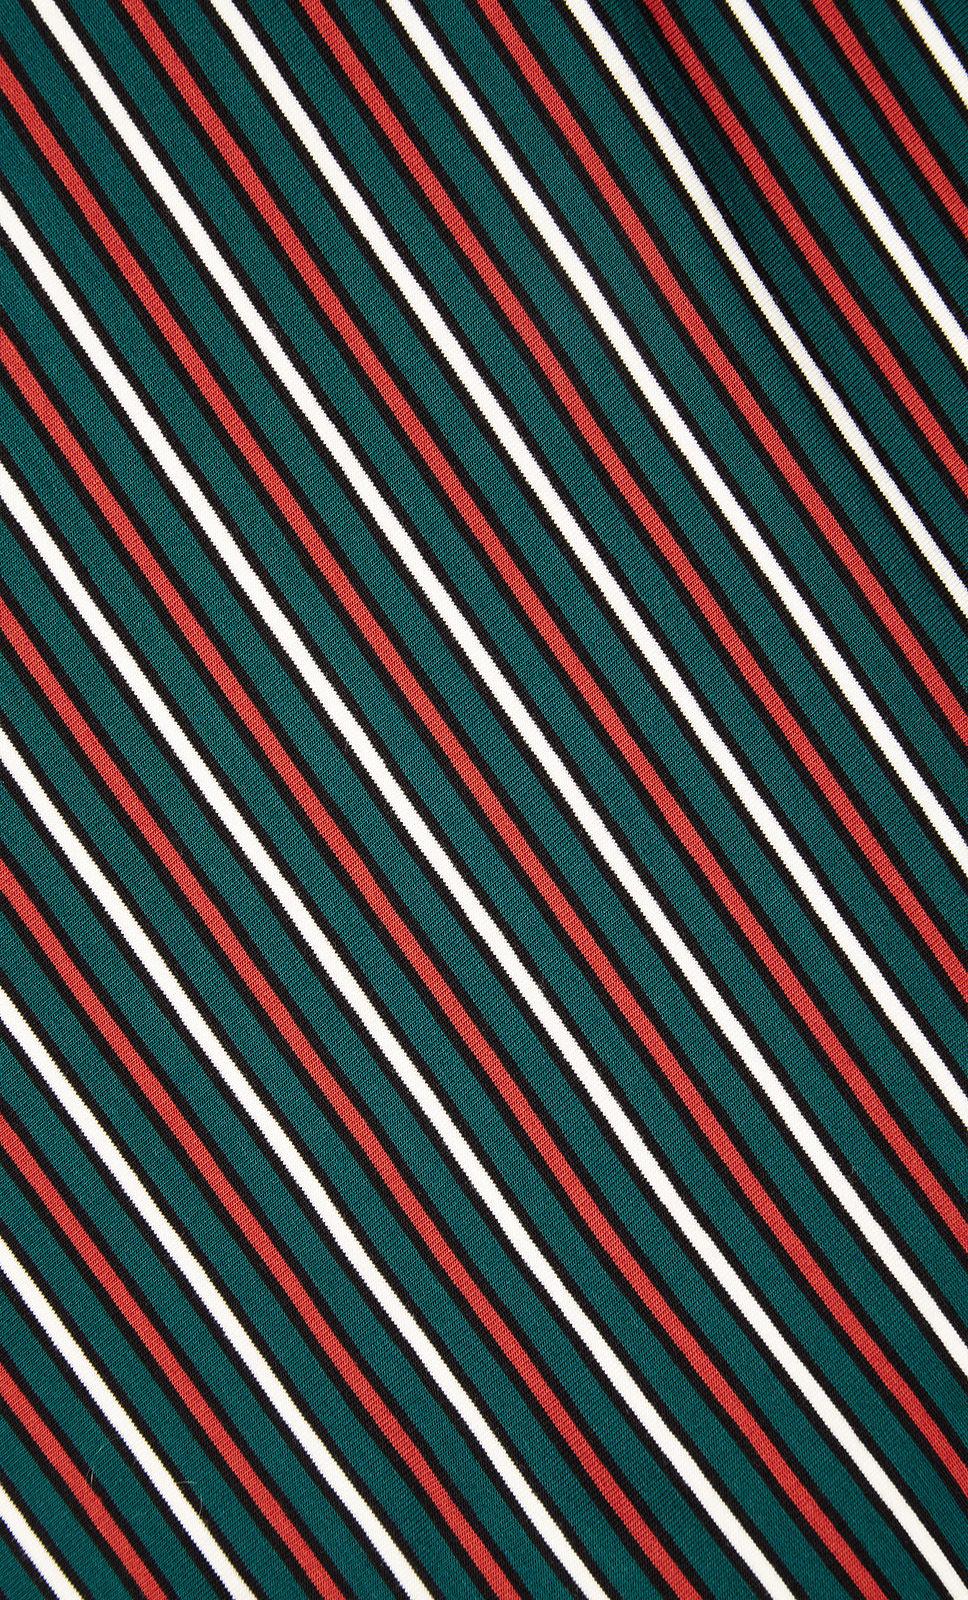 Blackjack-Stripe-Dragonfly-Green